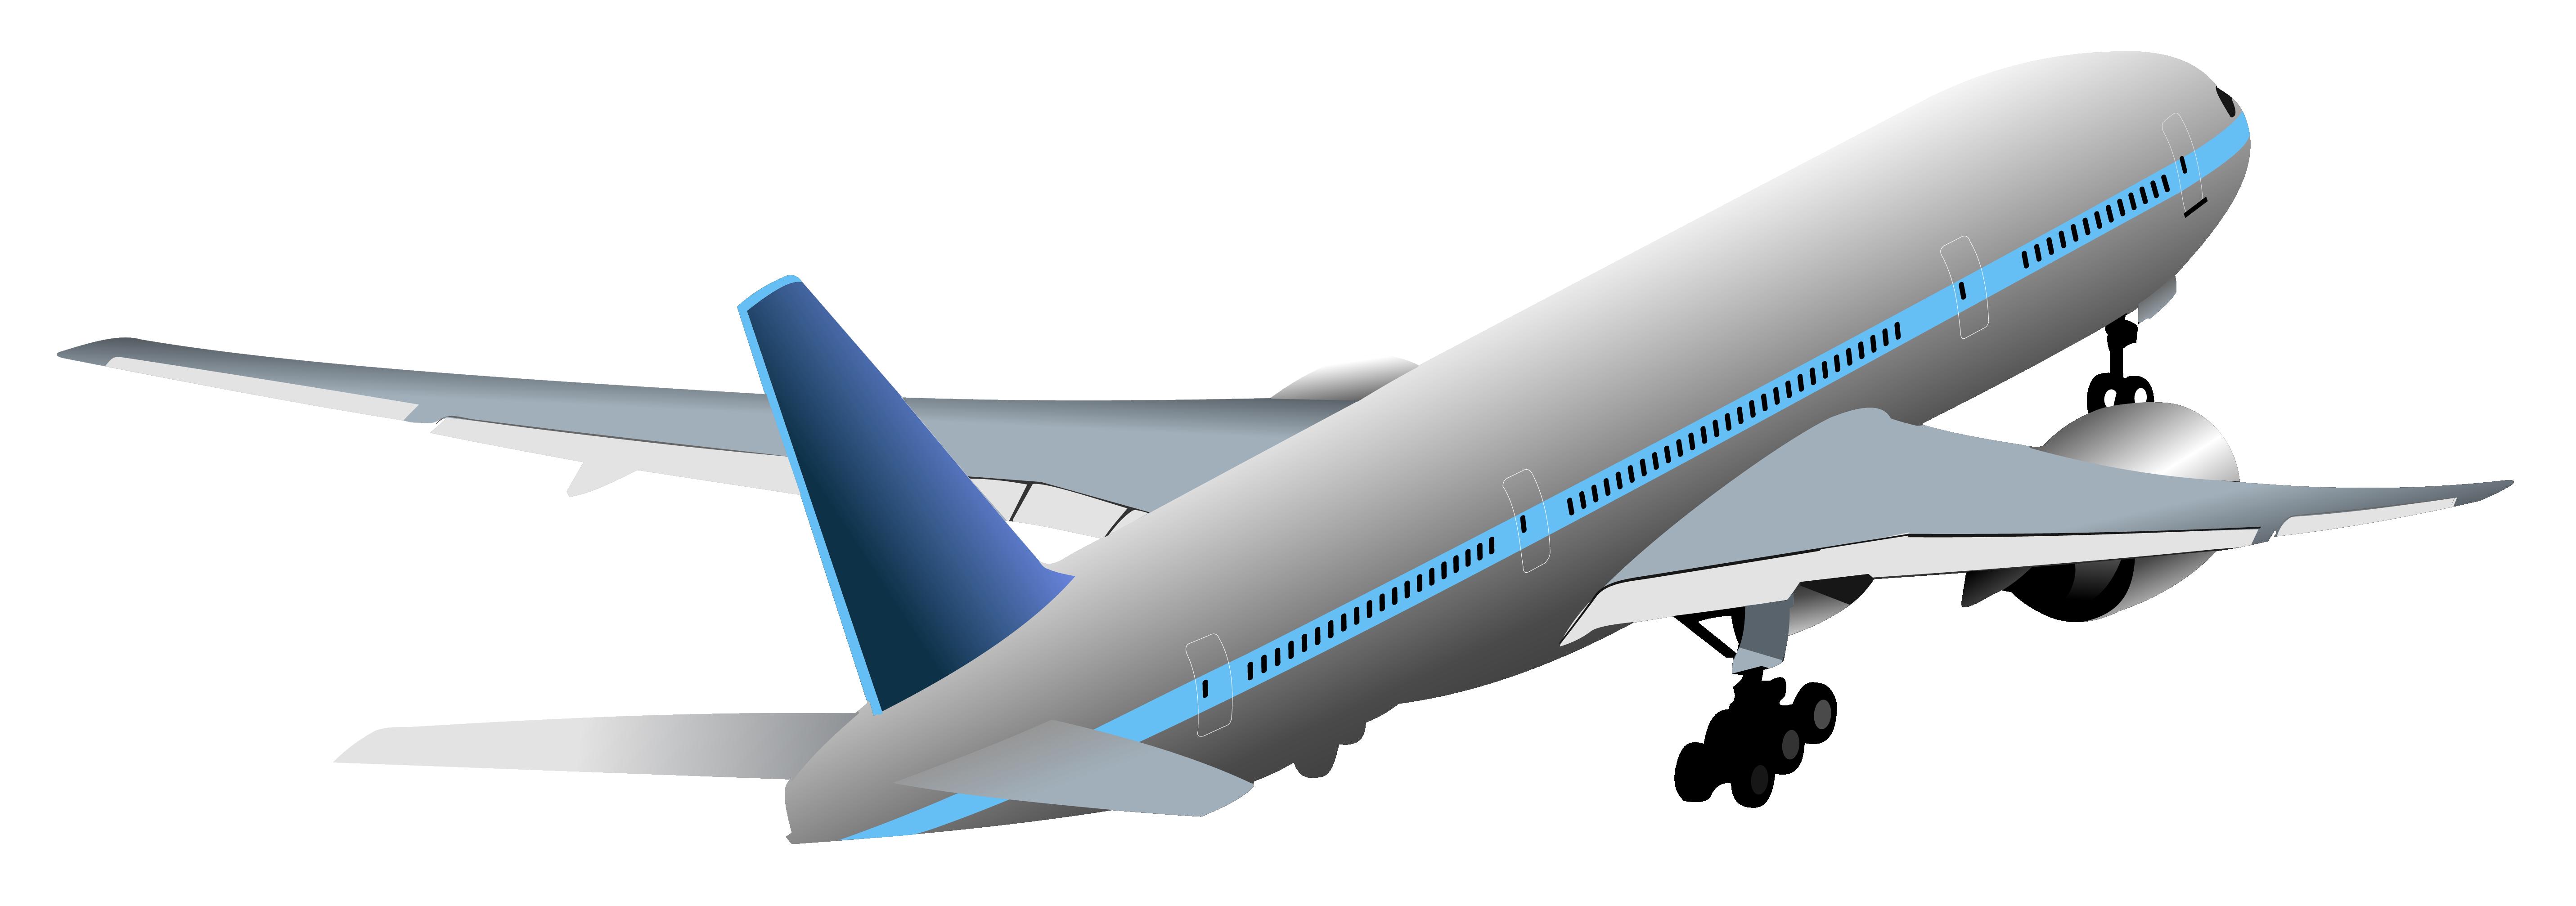 Clipart plane voyage. Transparent aircraft png vector